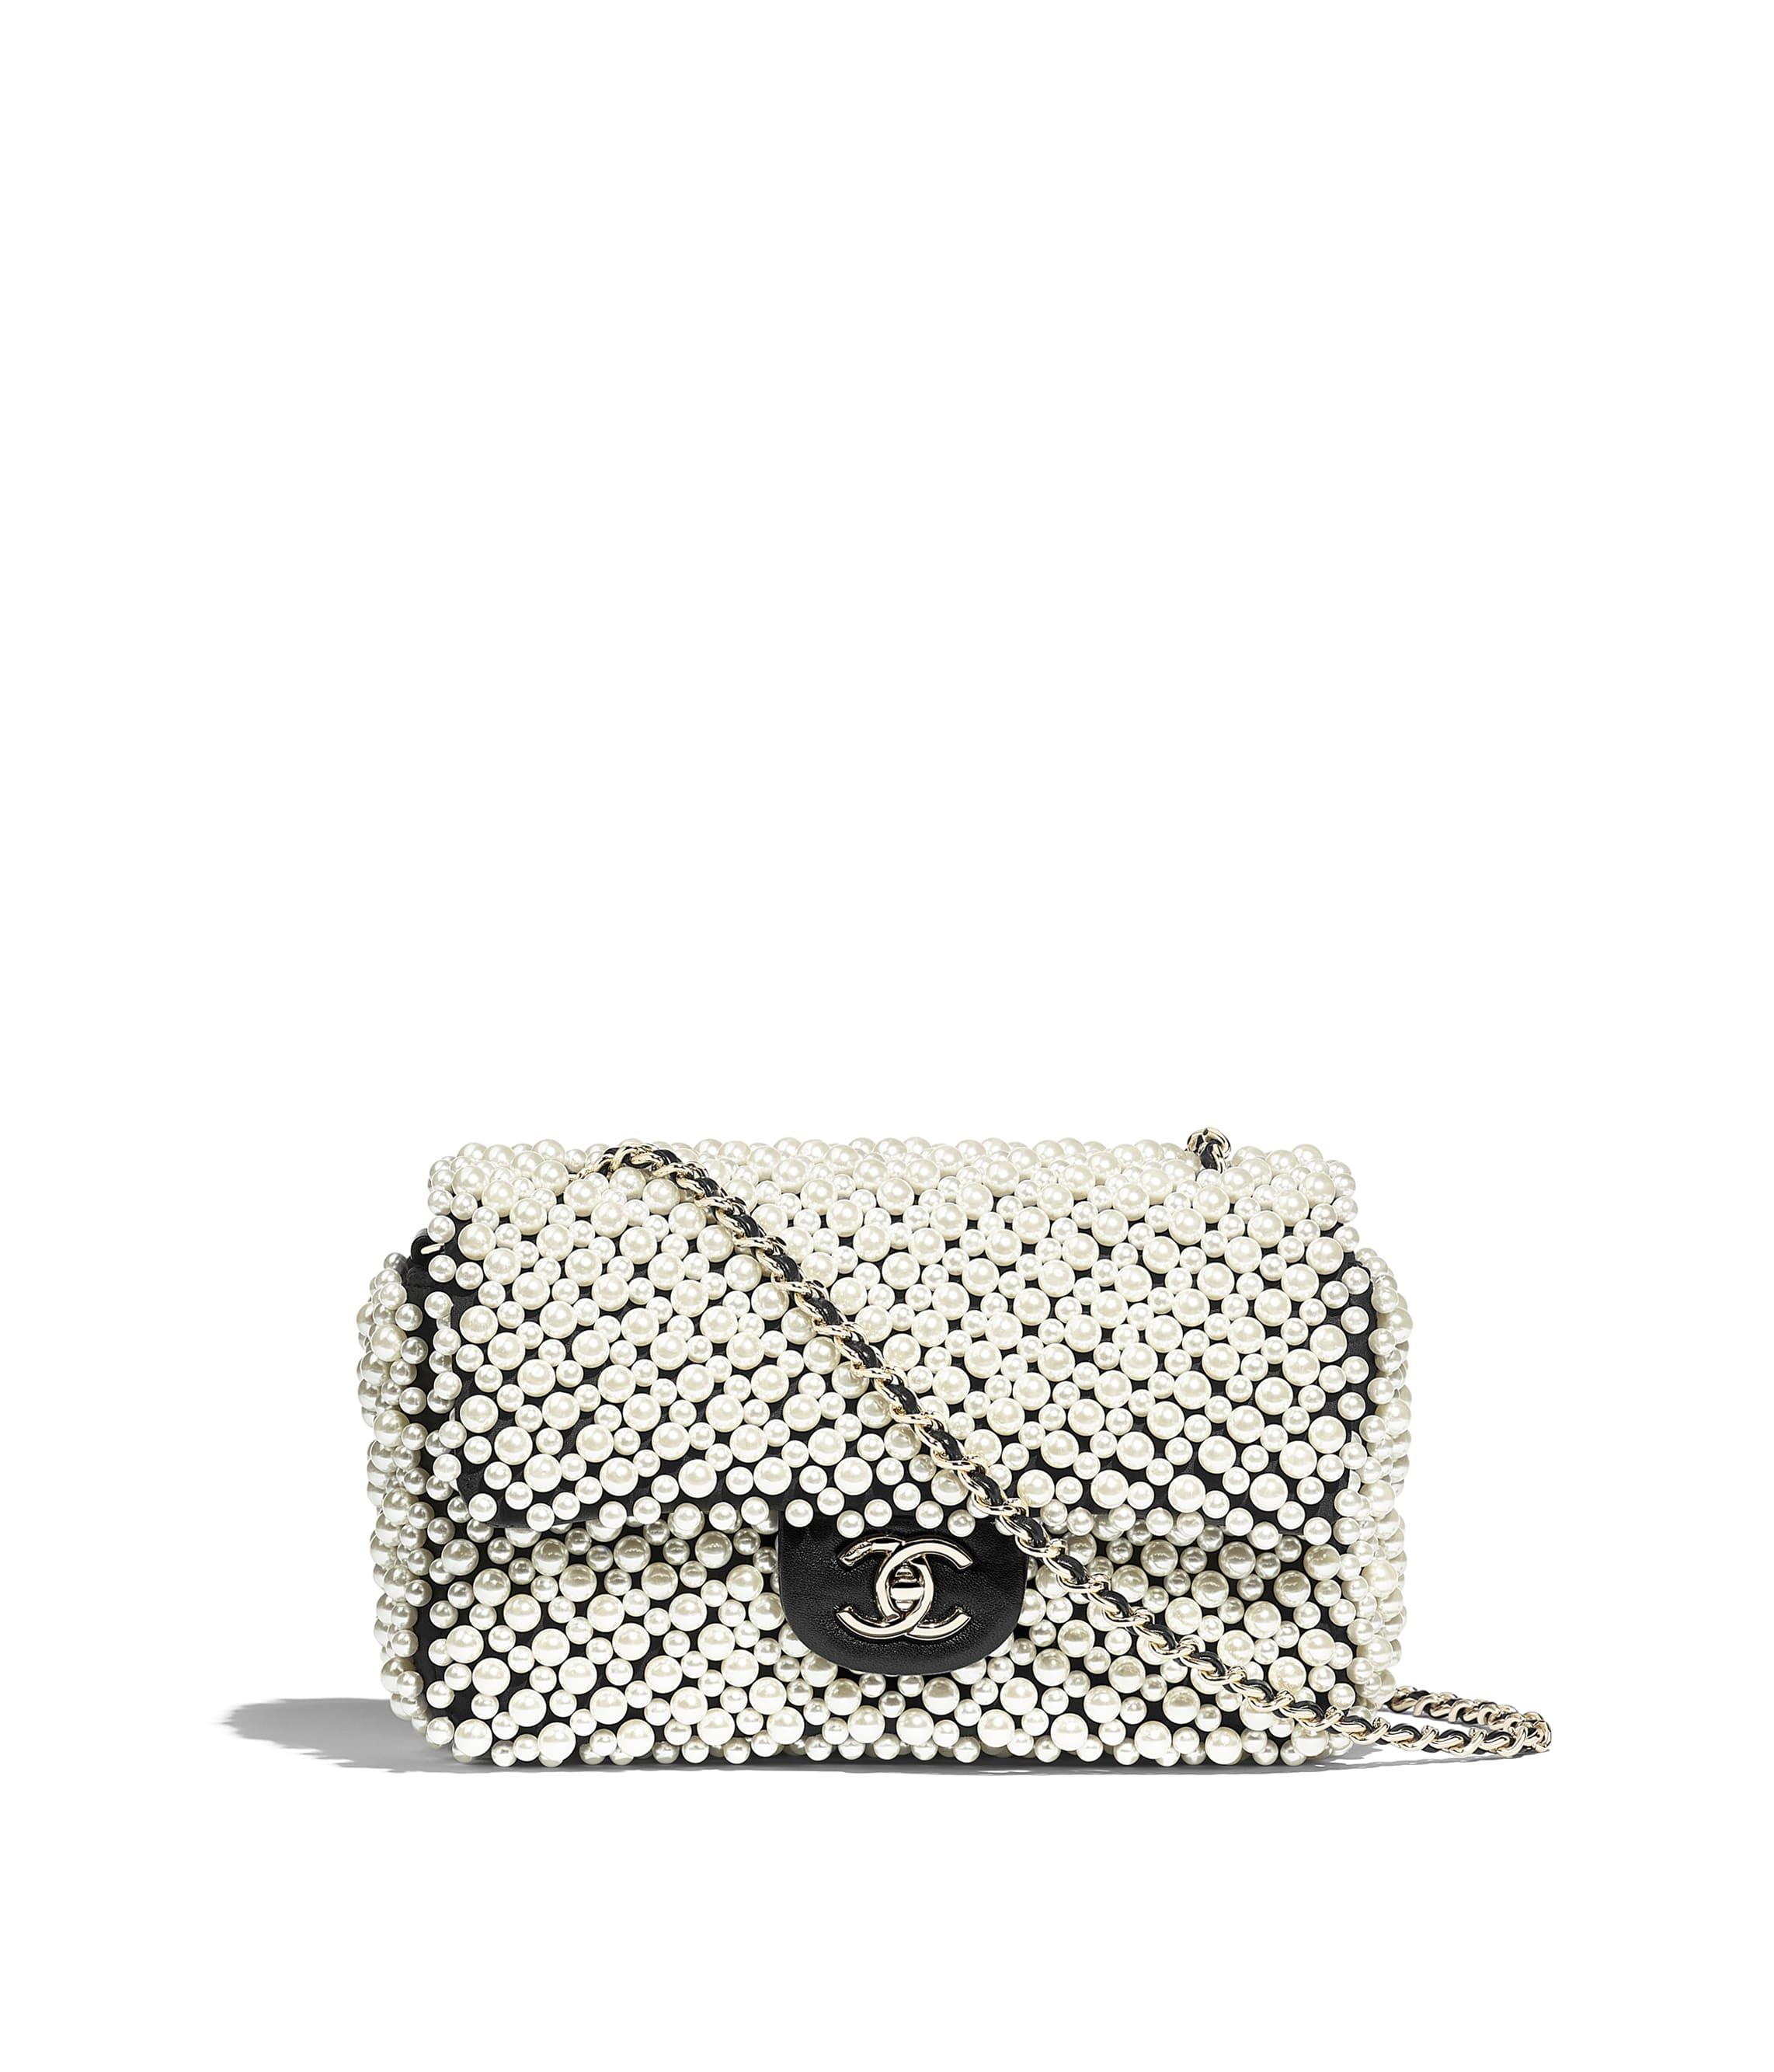 89ba631665cccd Flap Bag, imitation pearls, lambskin & gold-tone metal, white ...